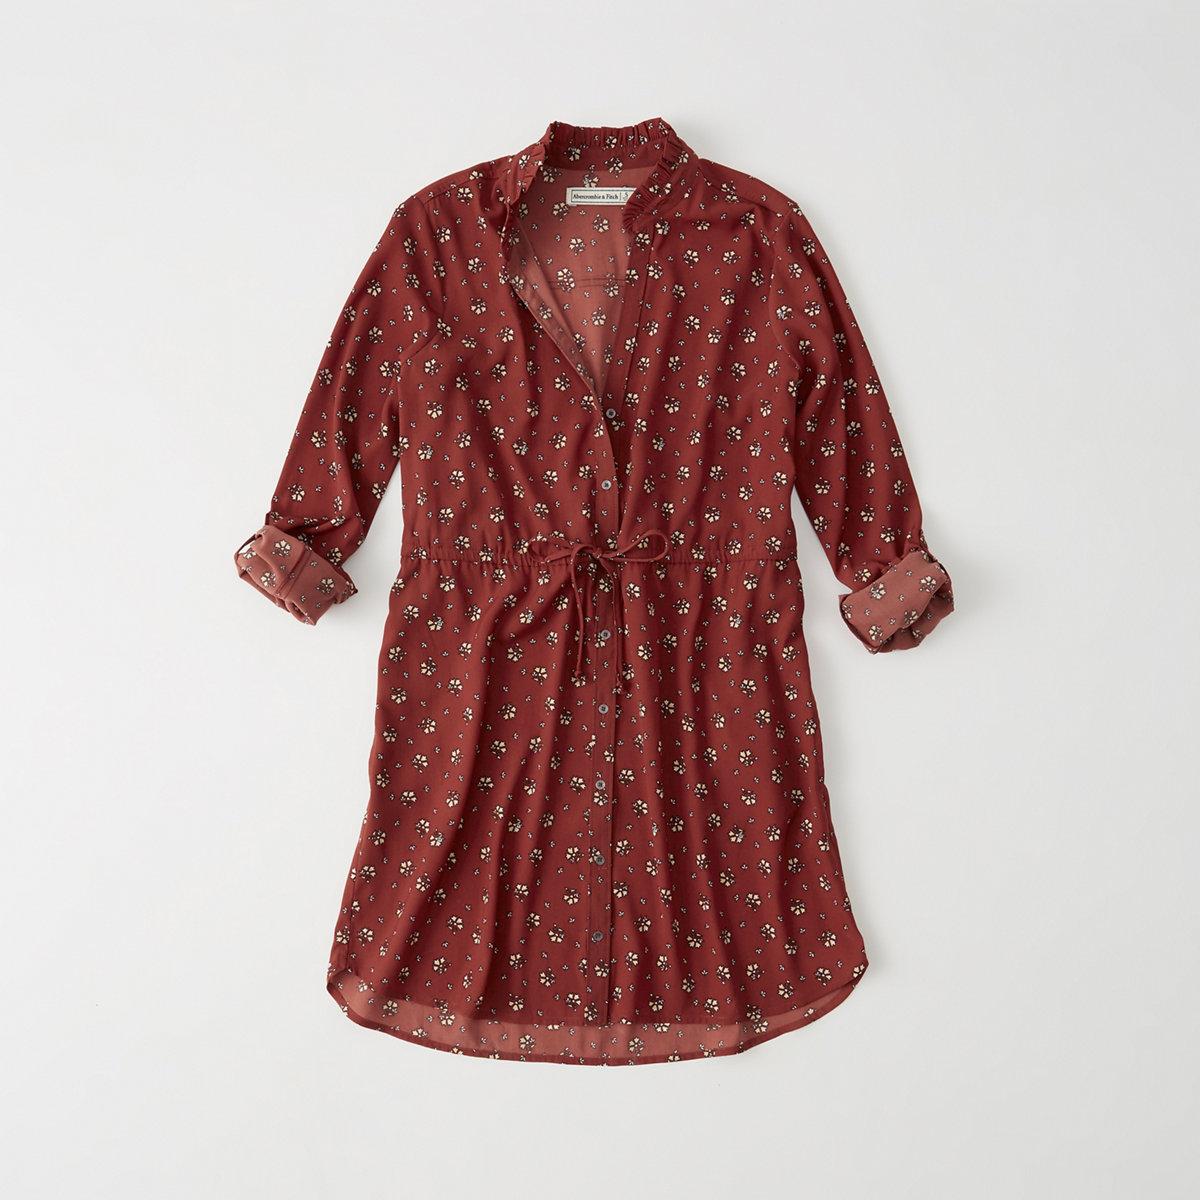 Classic Shirtdress